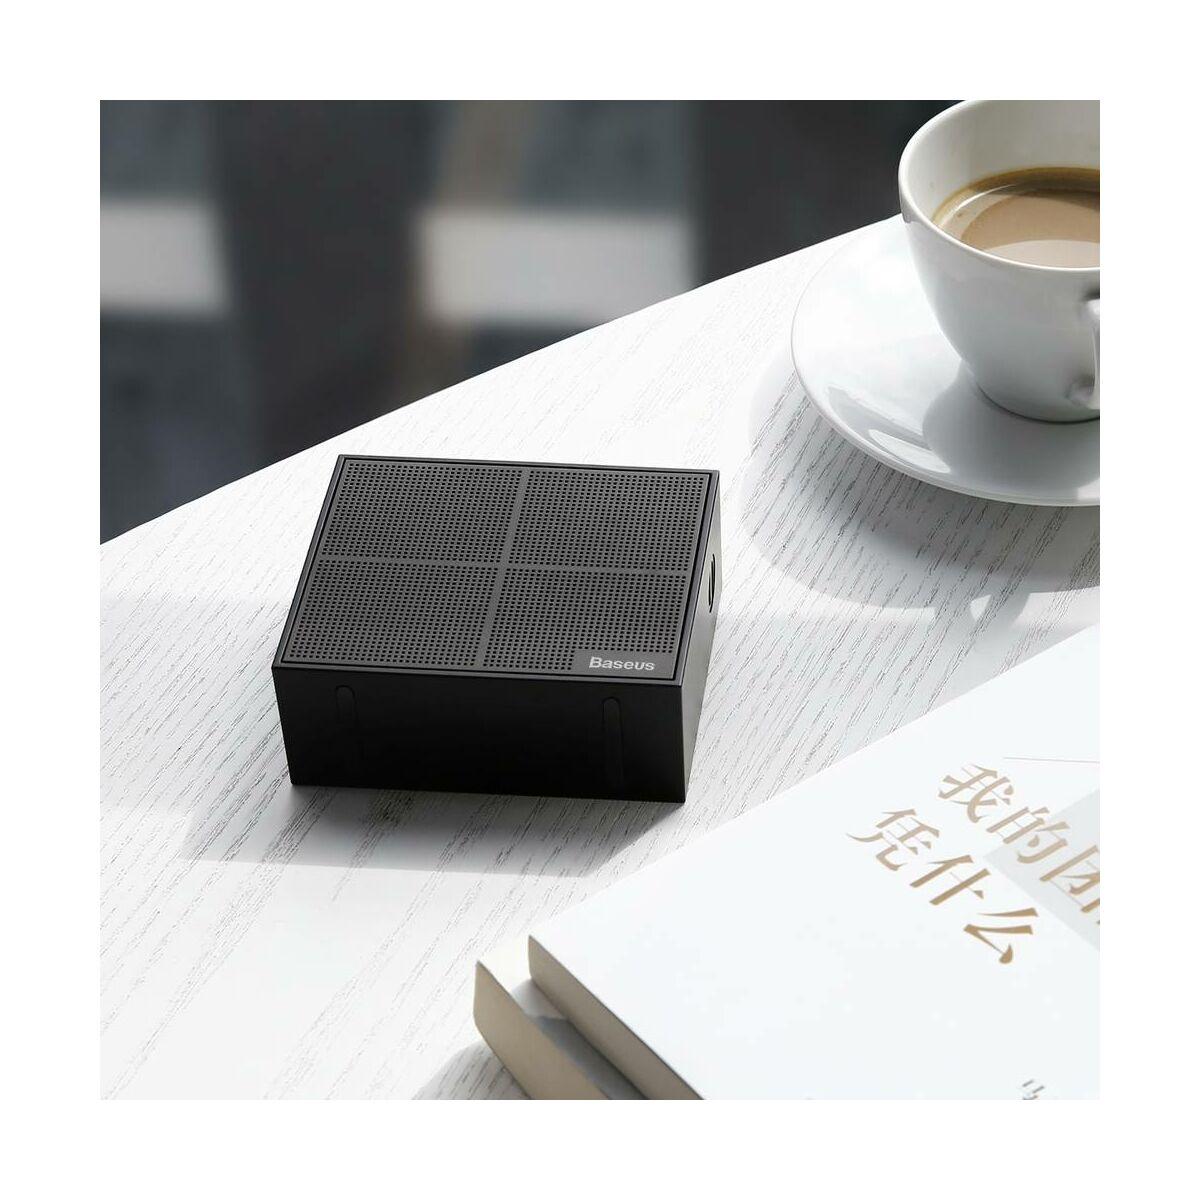 Baseus Hordozható hangszóró, Bluetooth Encok E05, Music-cube, fekete (NGE05-01)